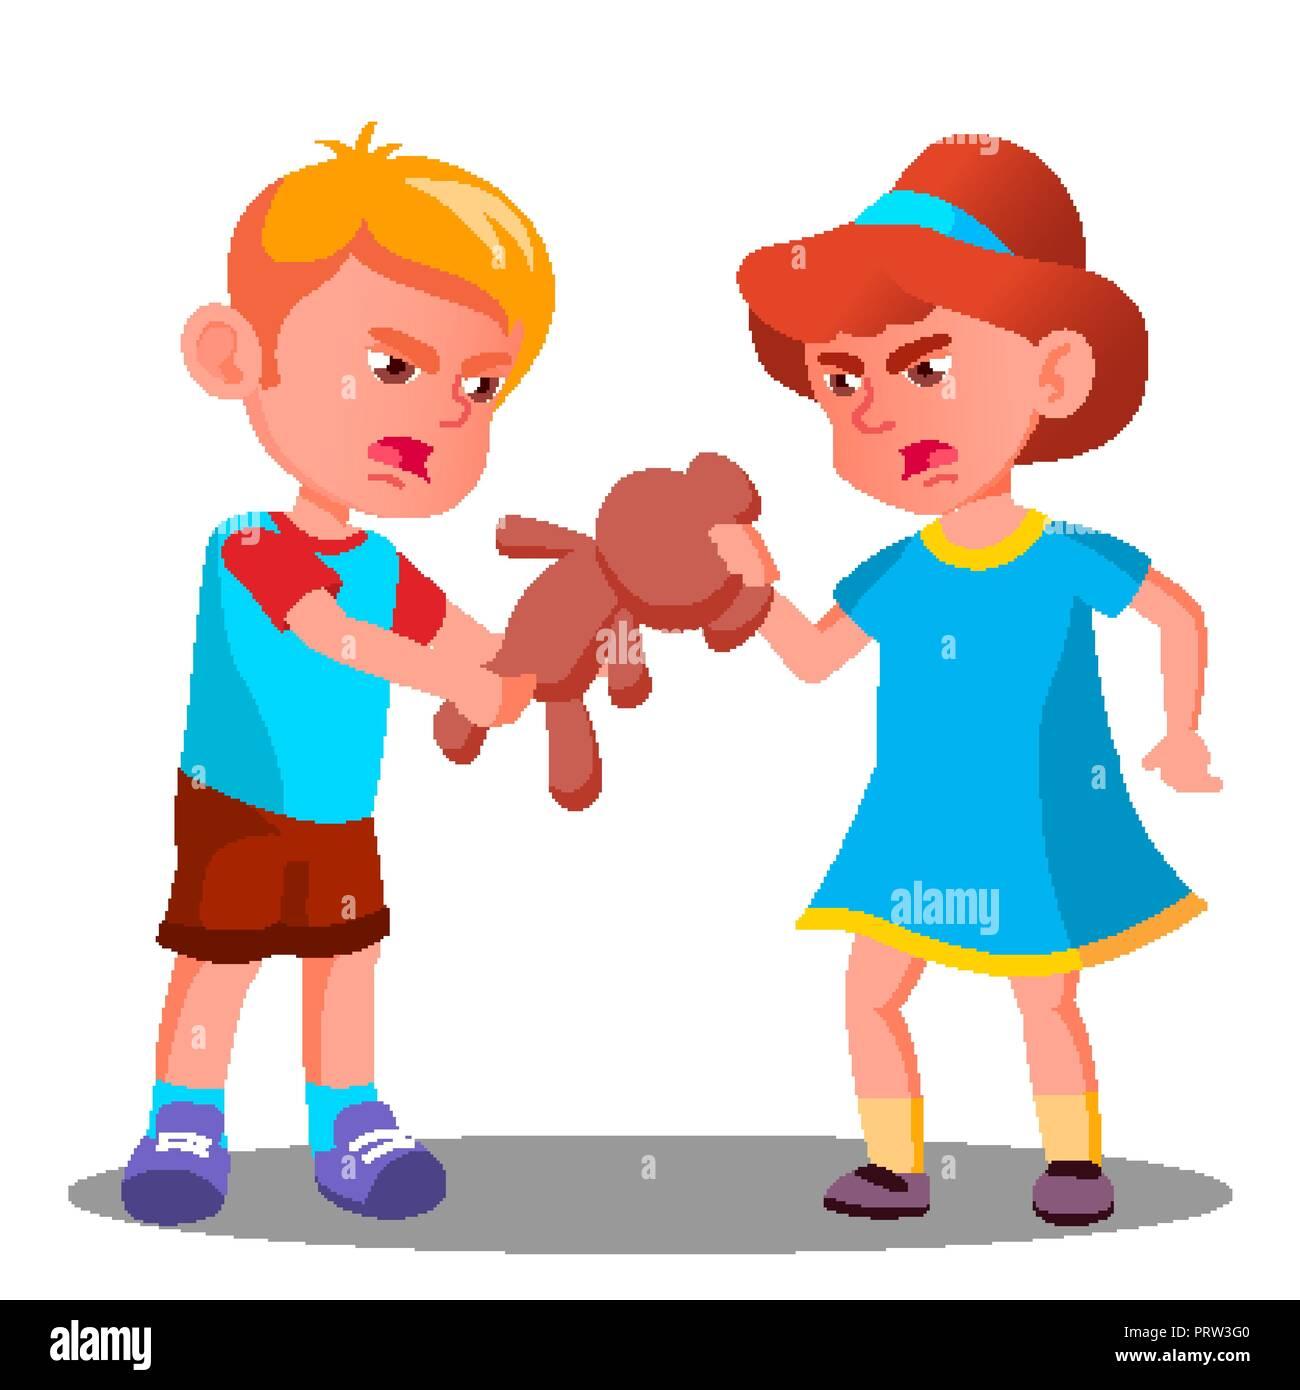 Juguete Dibujo Niños Peleando Wwwimagenesmycom